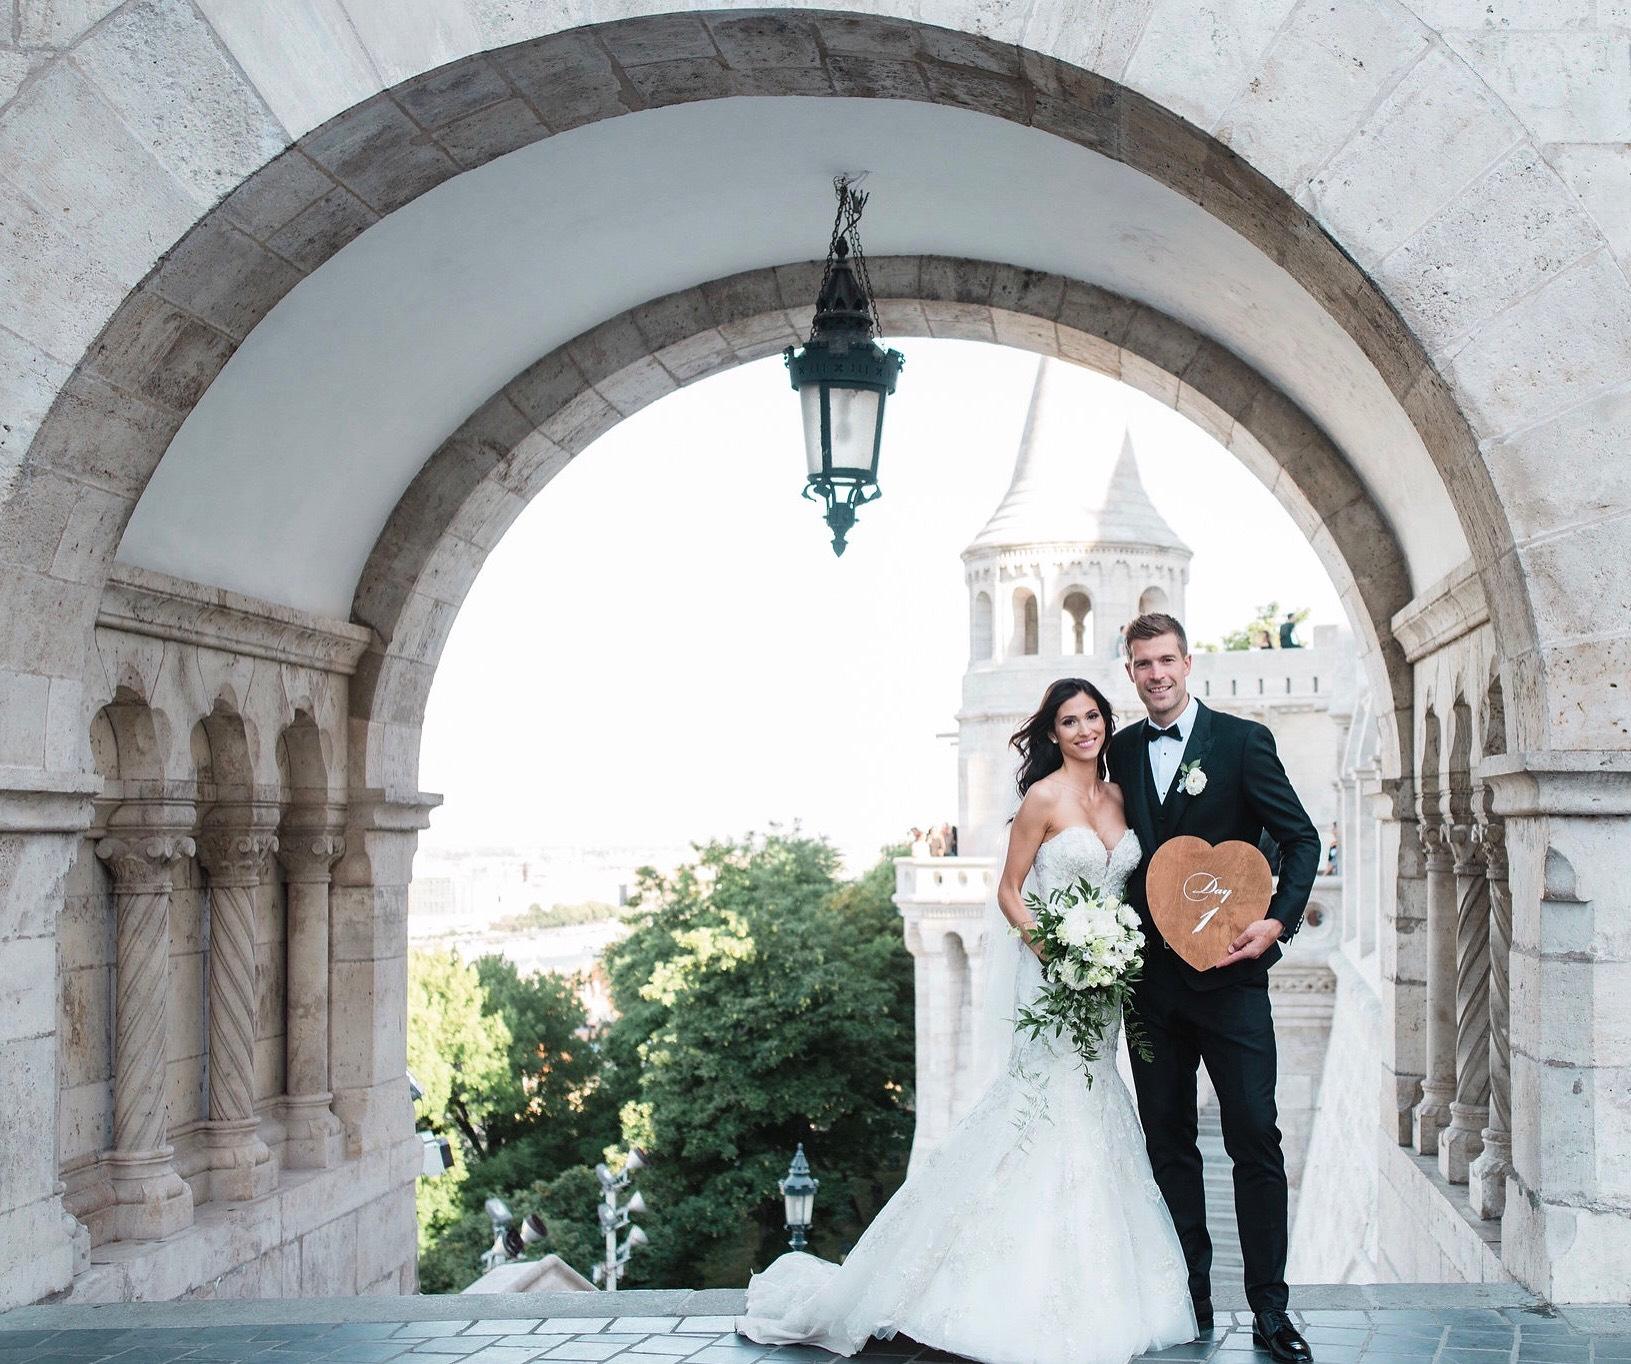 © Futács Gitta/ Theodora Simon Wedding Photography